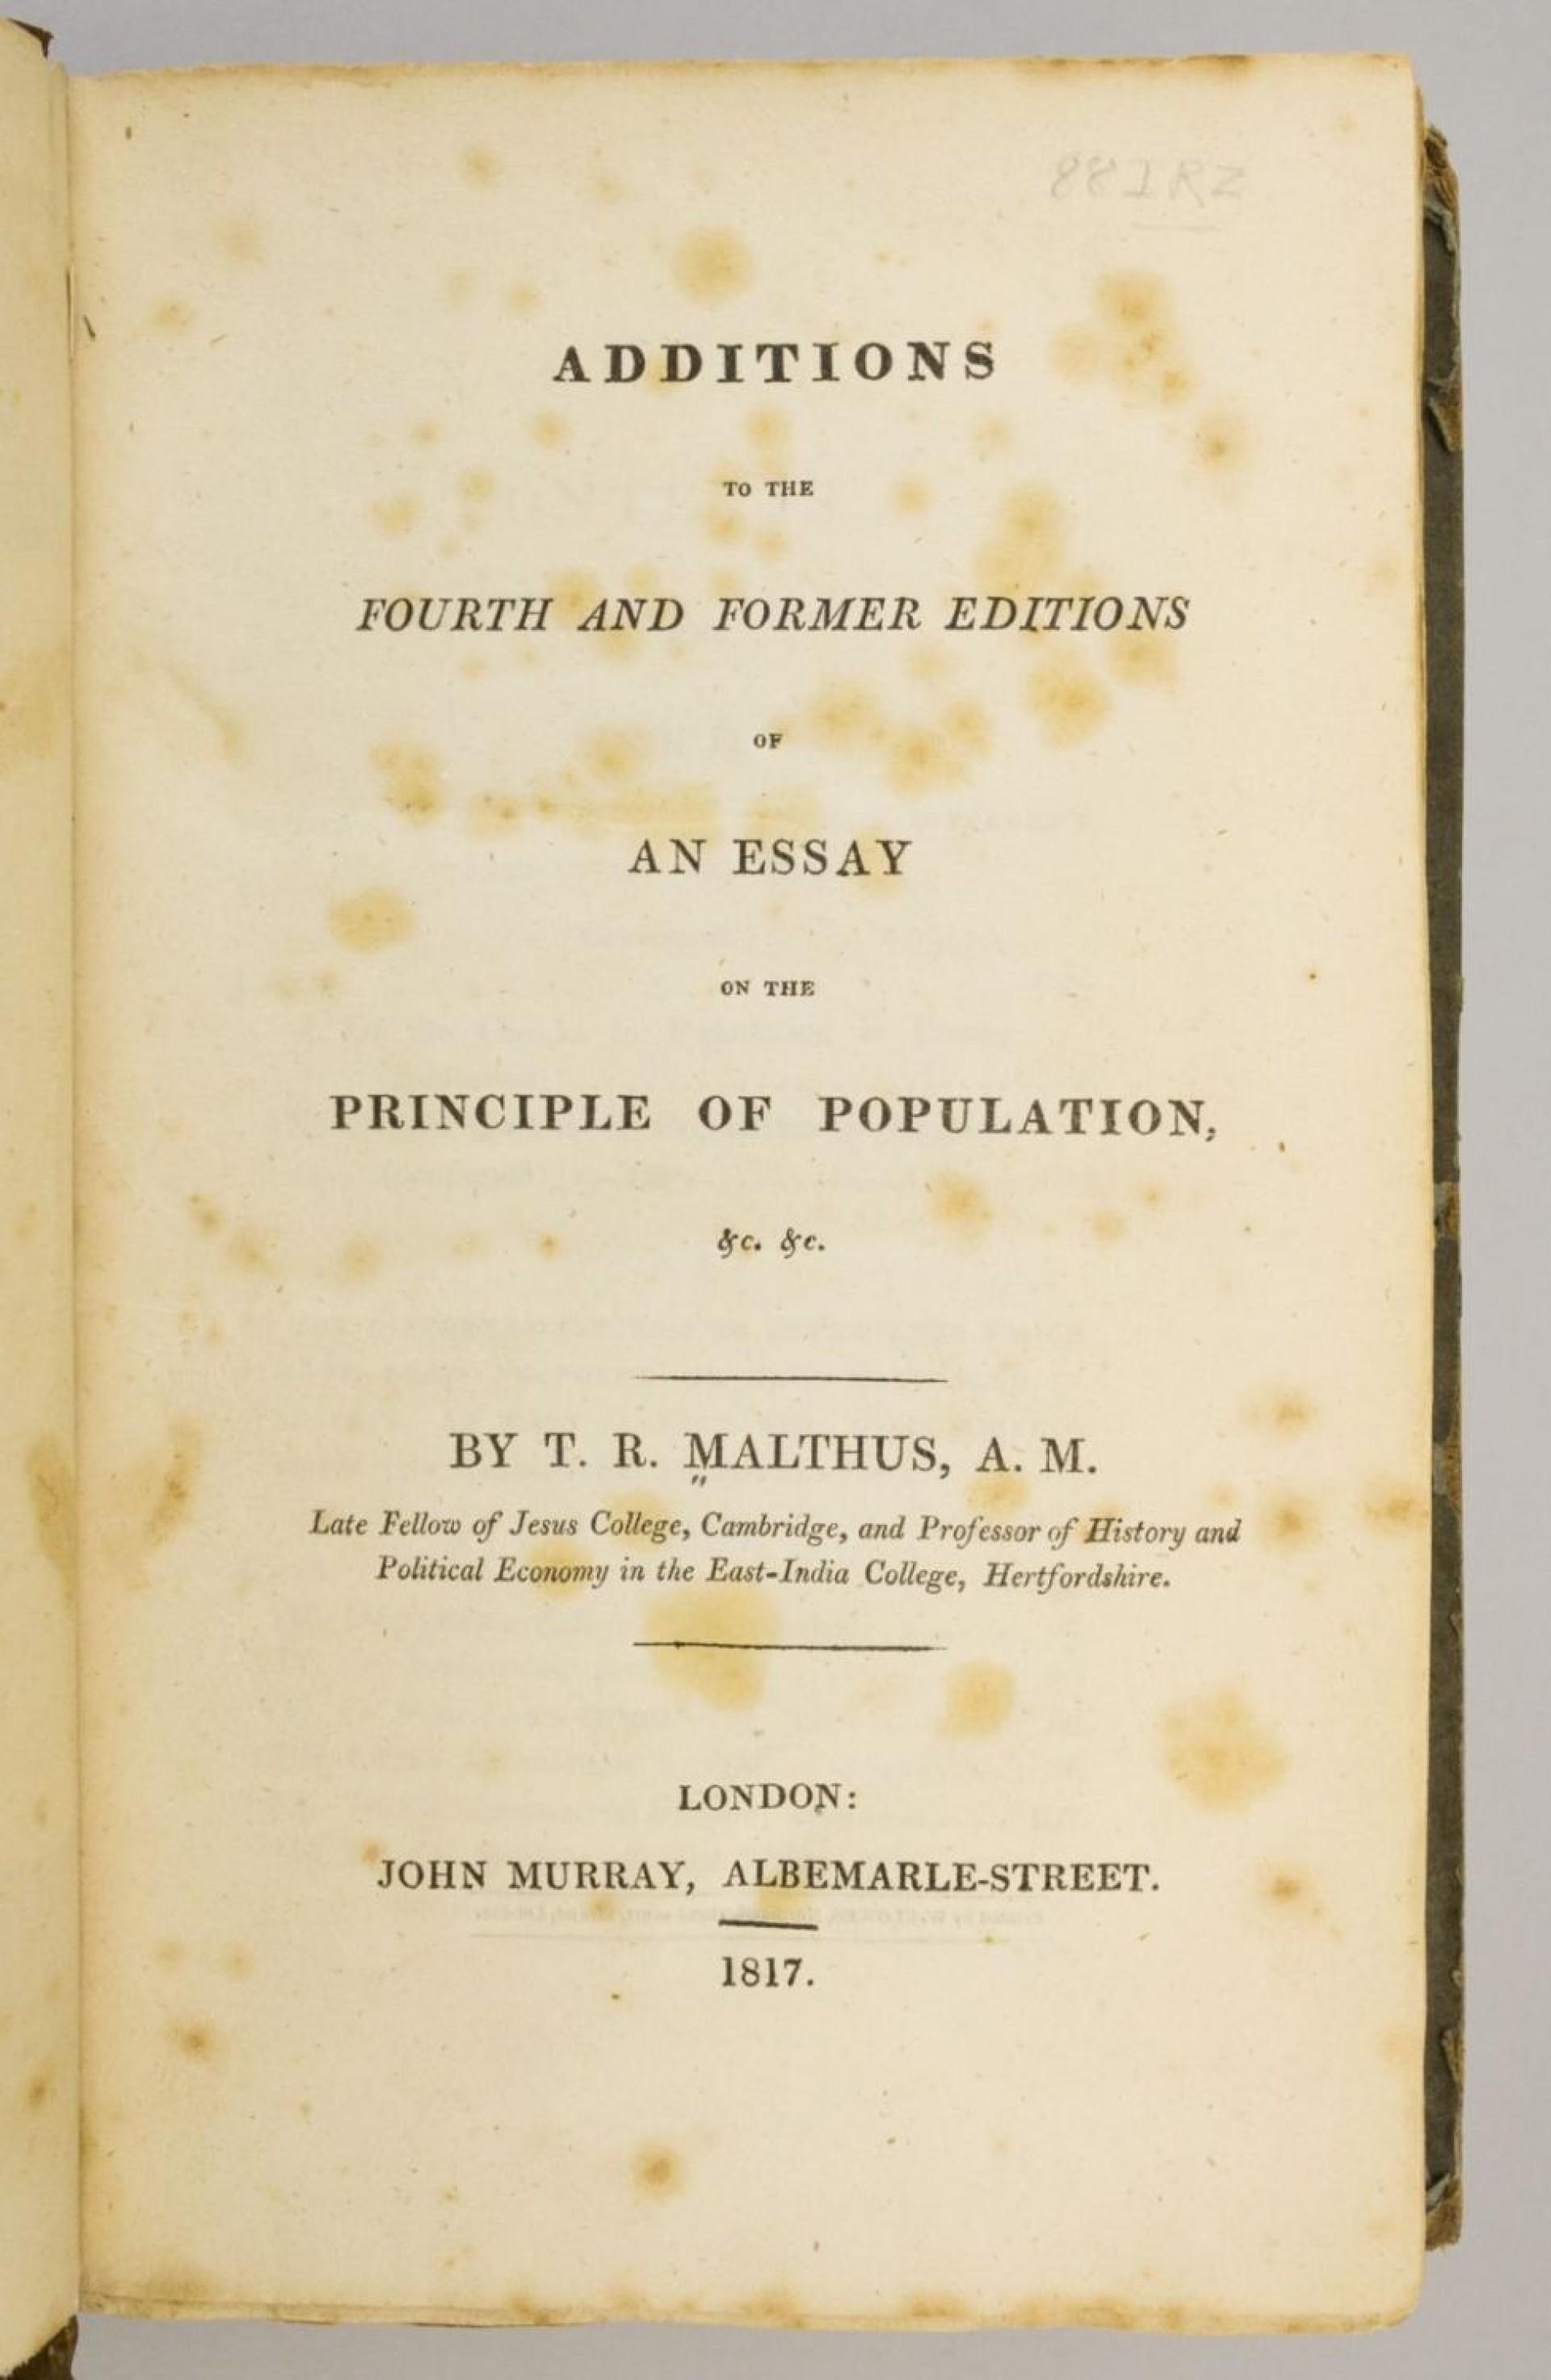 004 Essay Example 5337830061 2 Thomas Malthus On The Principle Of Stupendous Population After Reading Malthus's Principles Darwin Got Idea That Ap Euro 1920